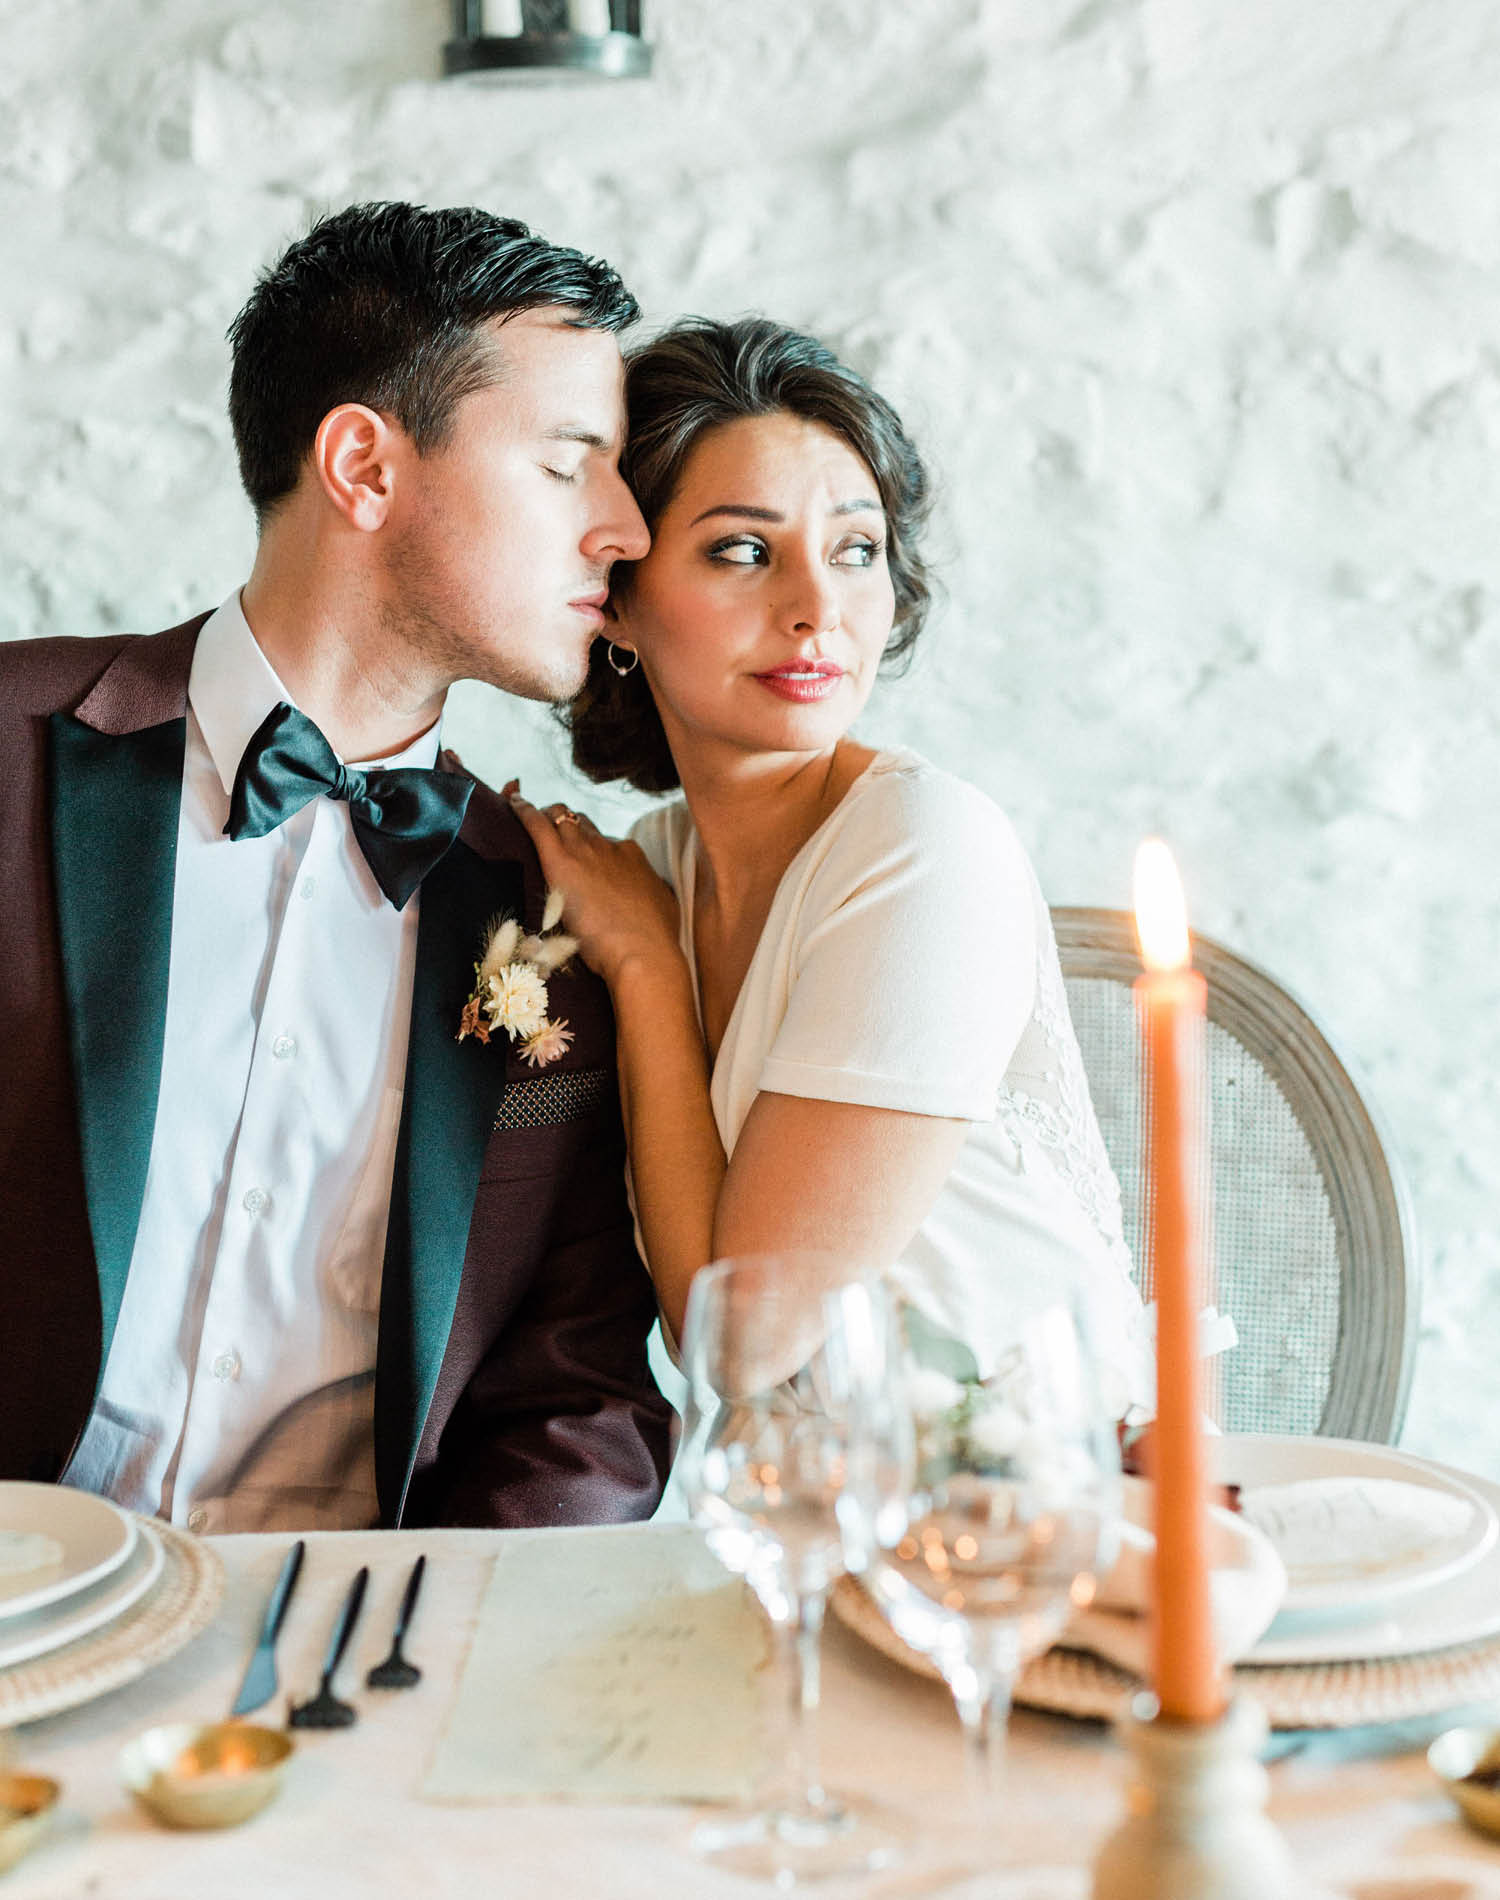 French Farm House Inspired Wedding in Quebec Auberge Saint-Antoine - Montreal Wedding Photographer